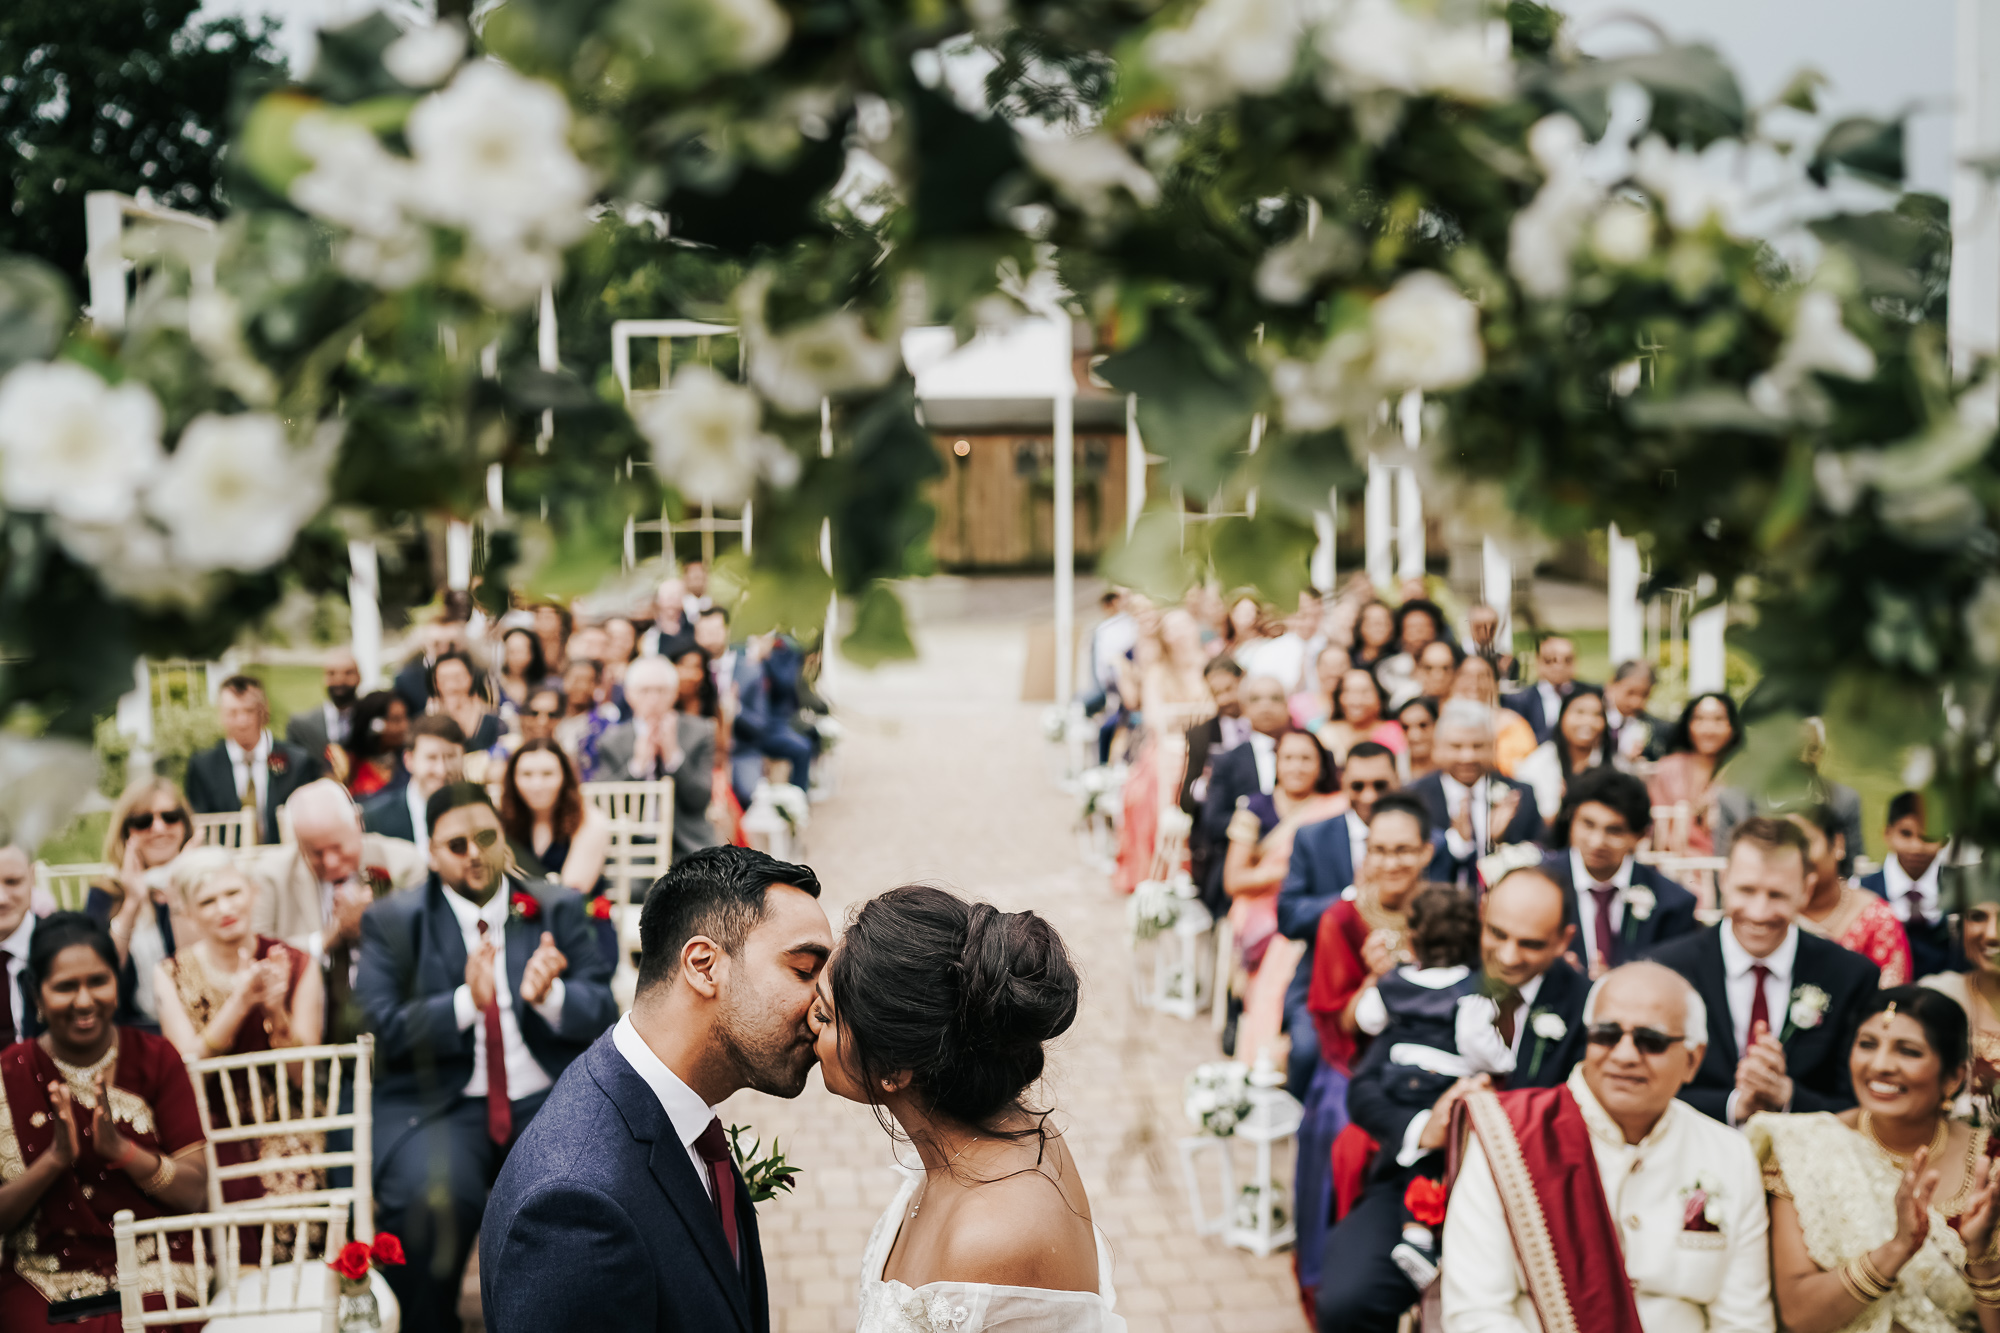 Alcumlow Hall Farm Indian Wedding Photographer (28 of 44).jpg